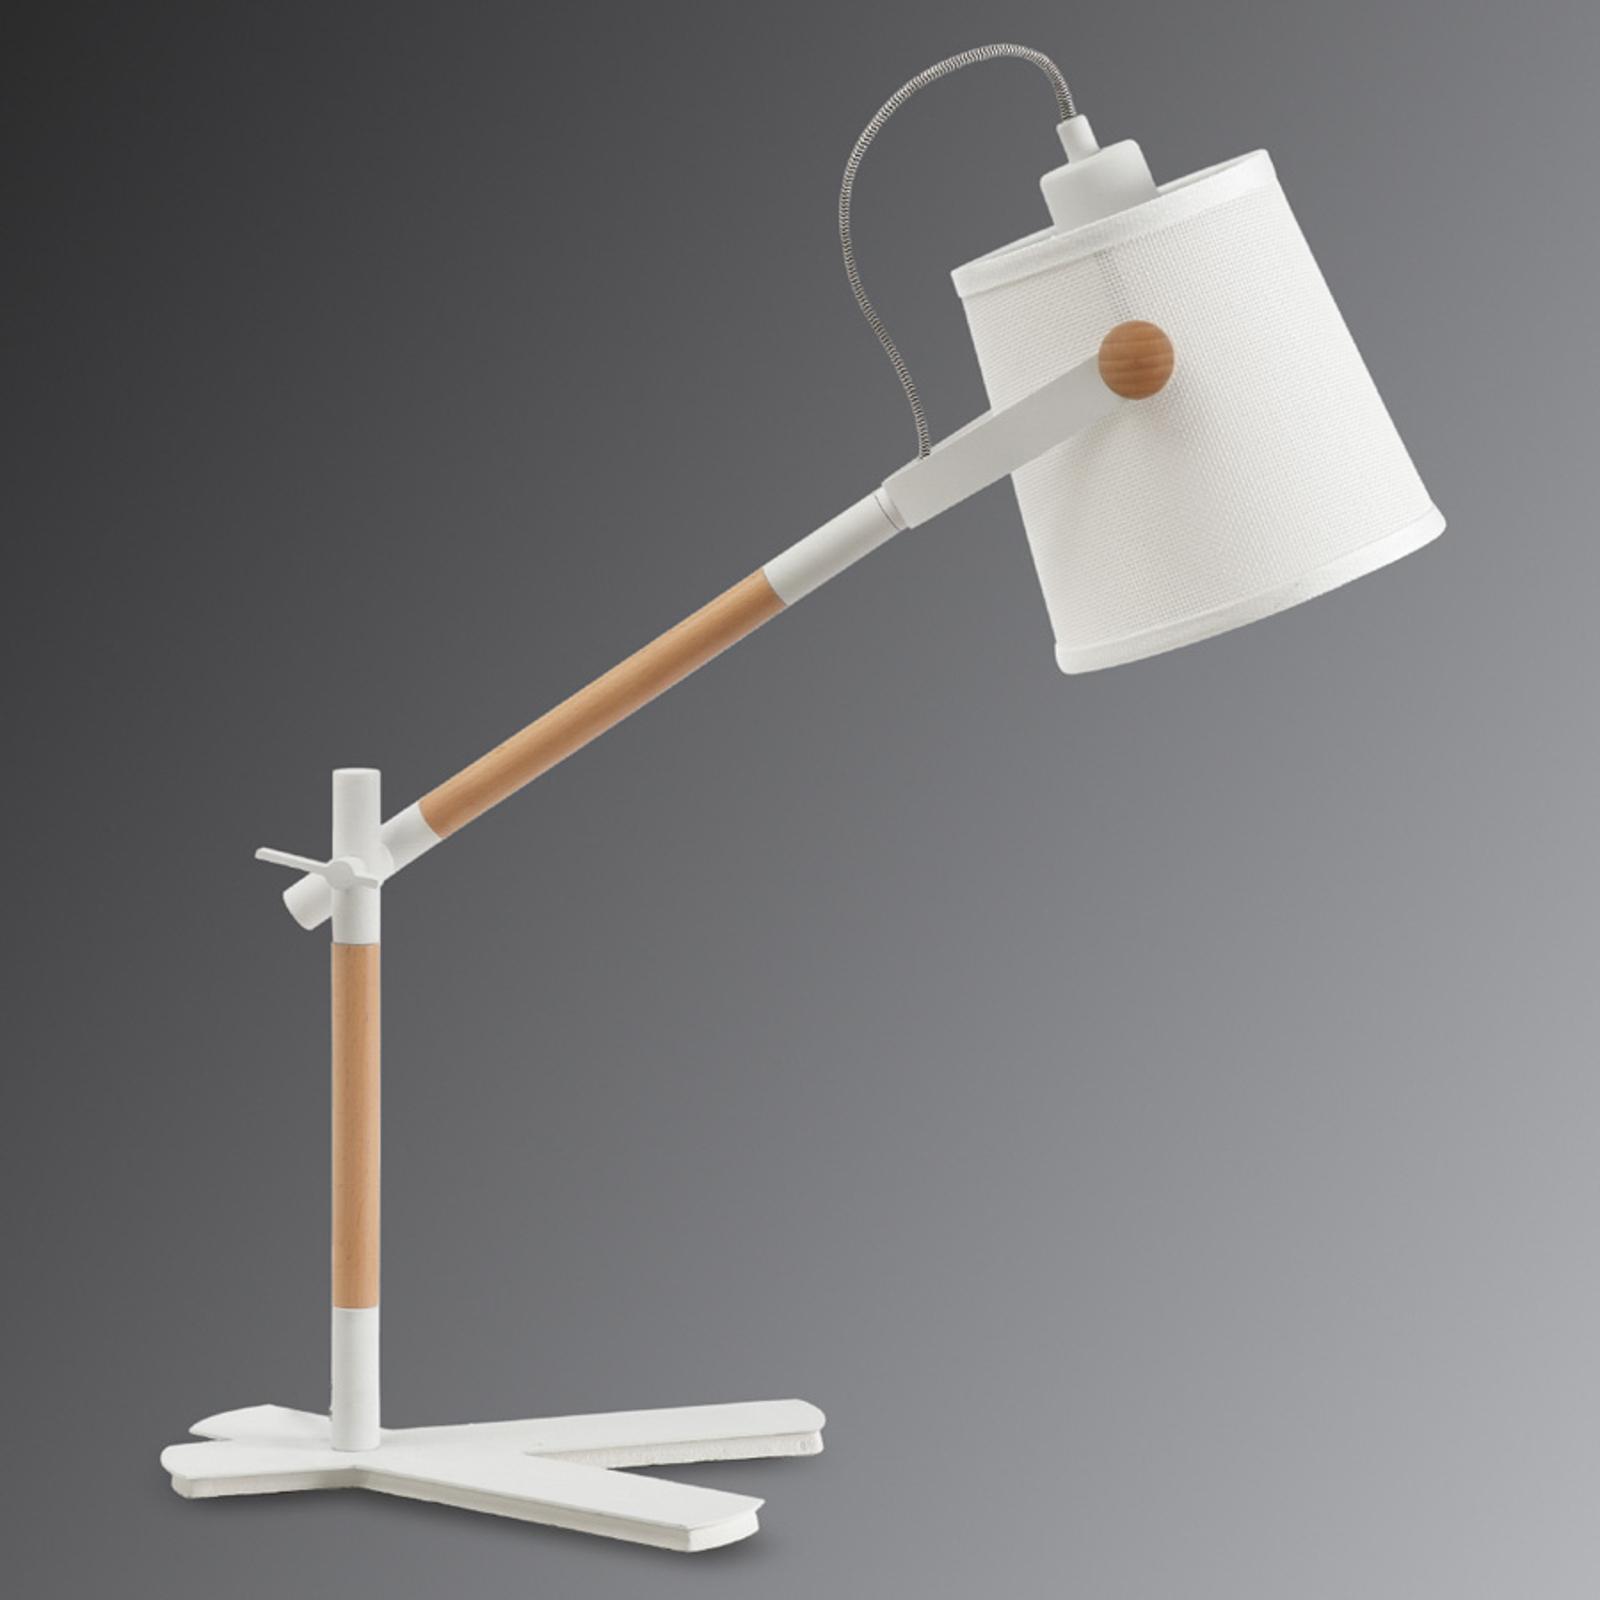 Lampe à poser en bois et tissu Nordica